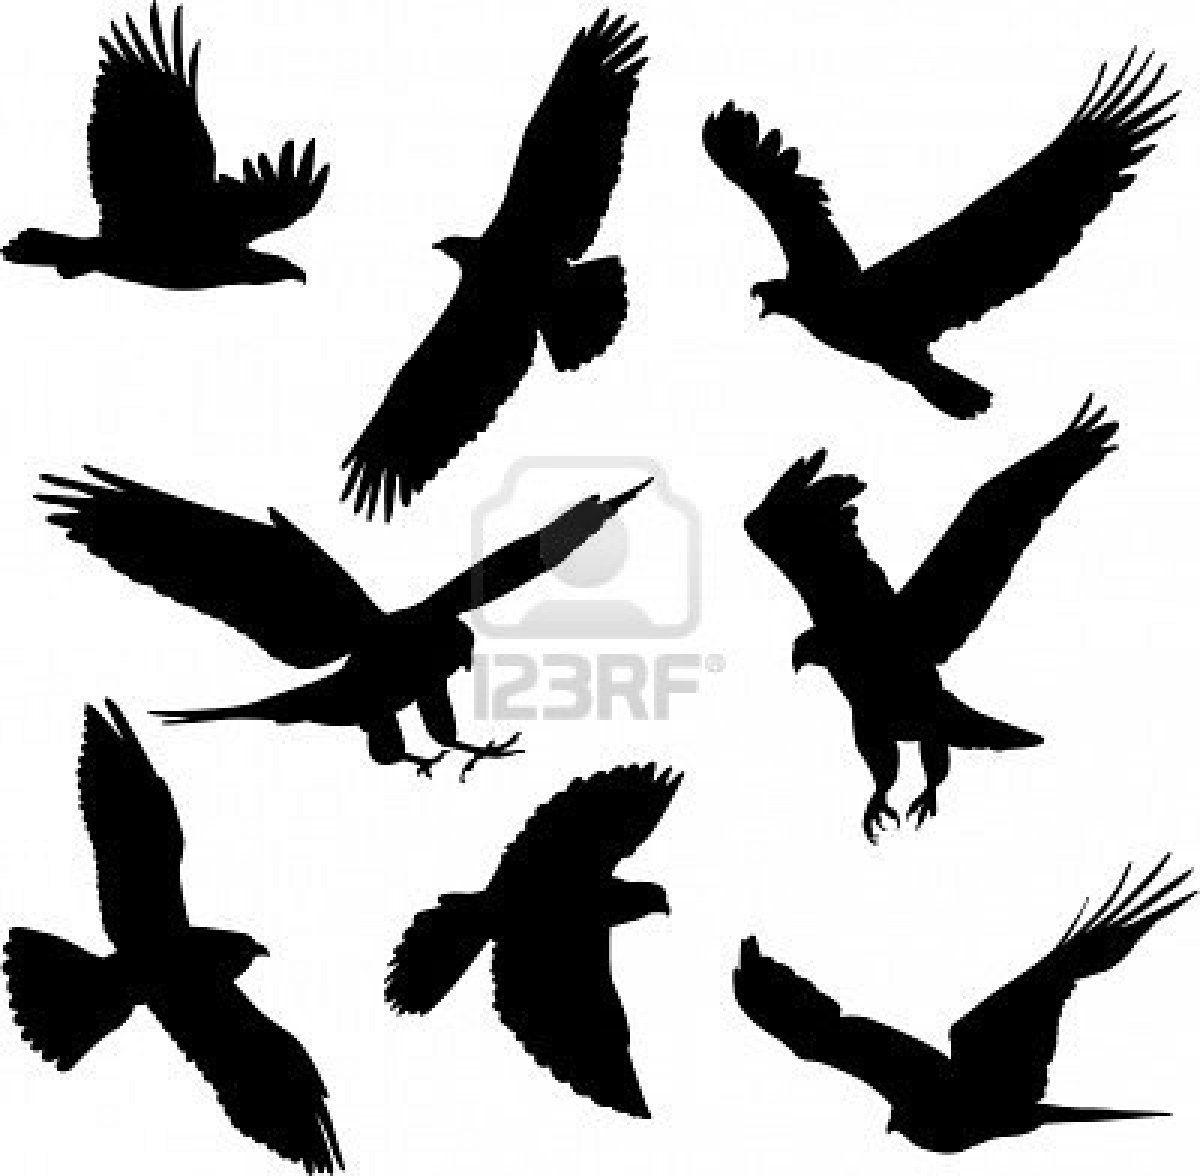 Bird sillhouettes